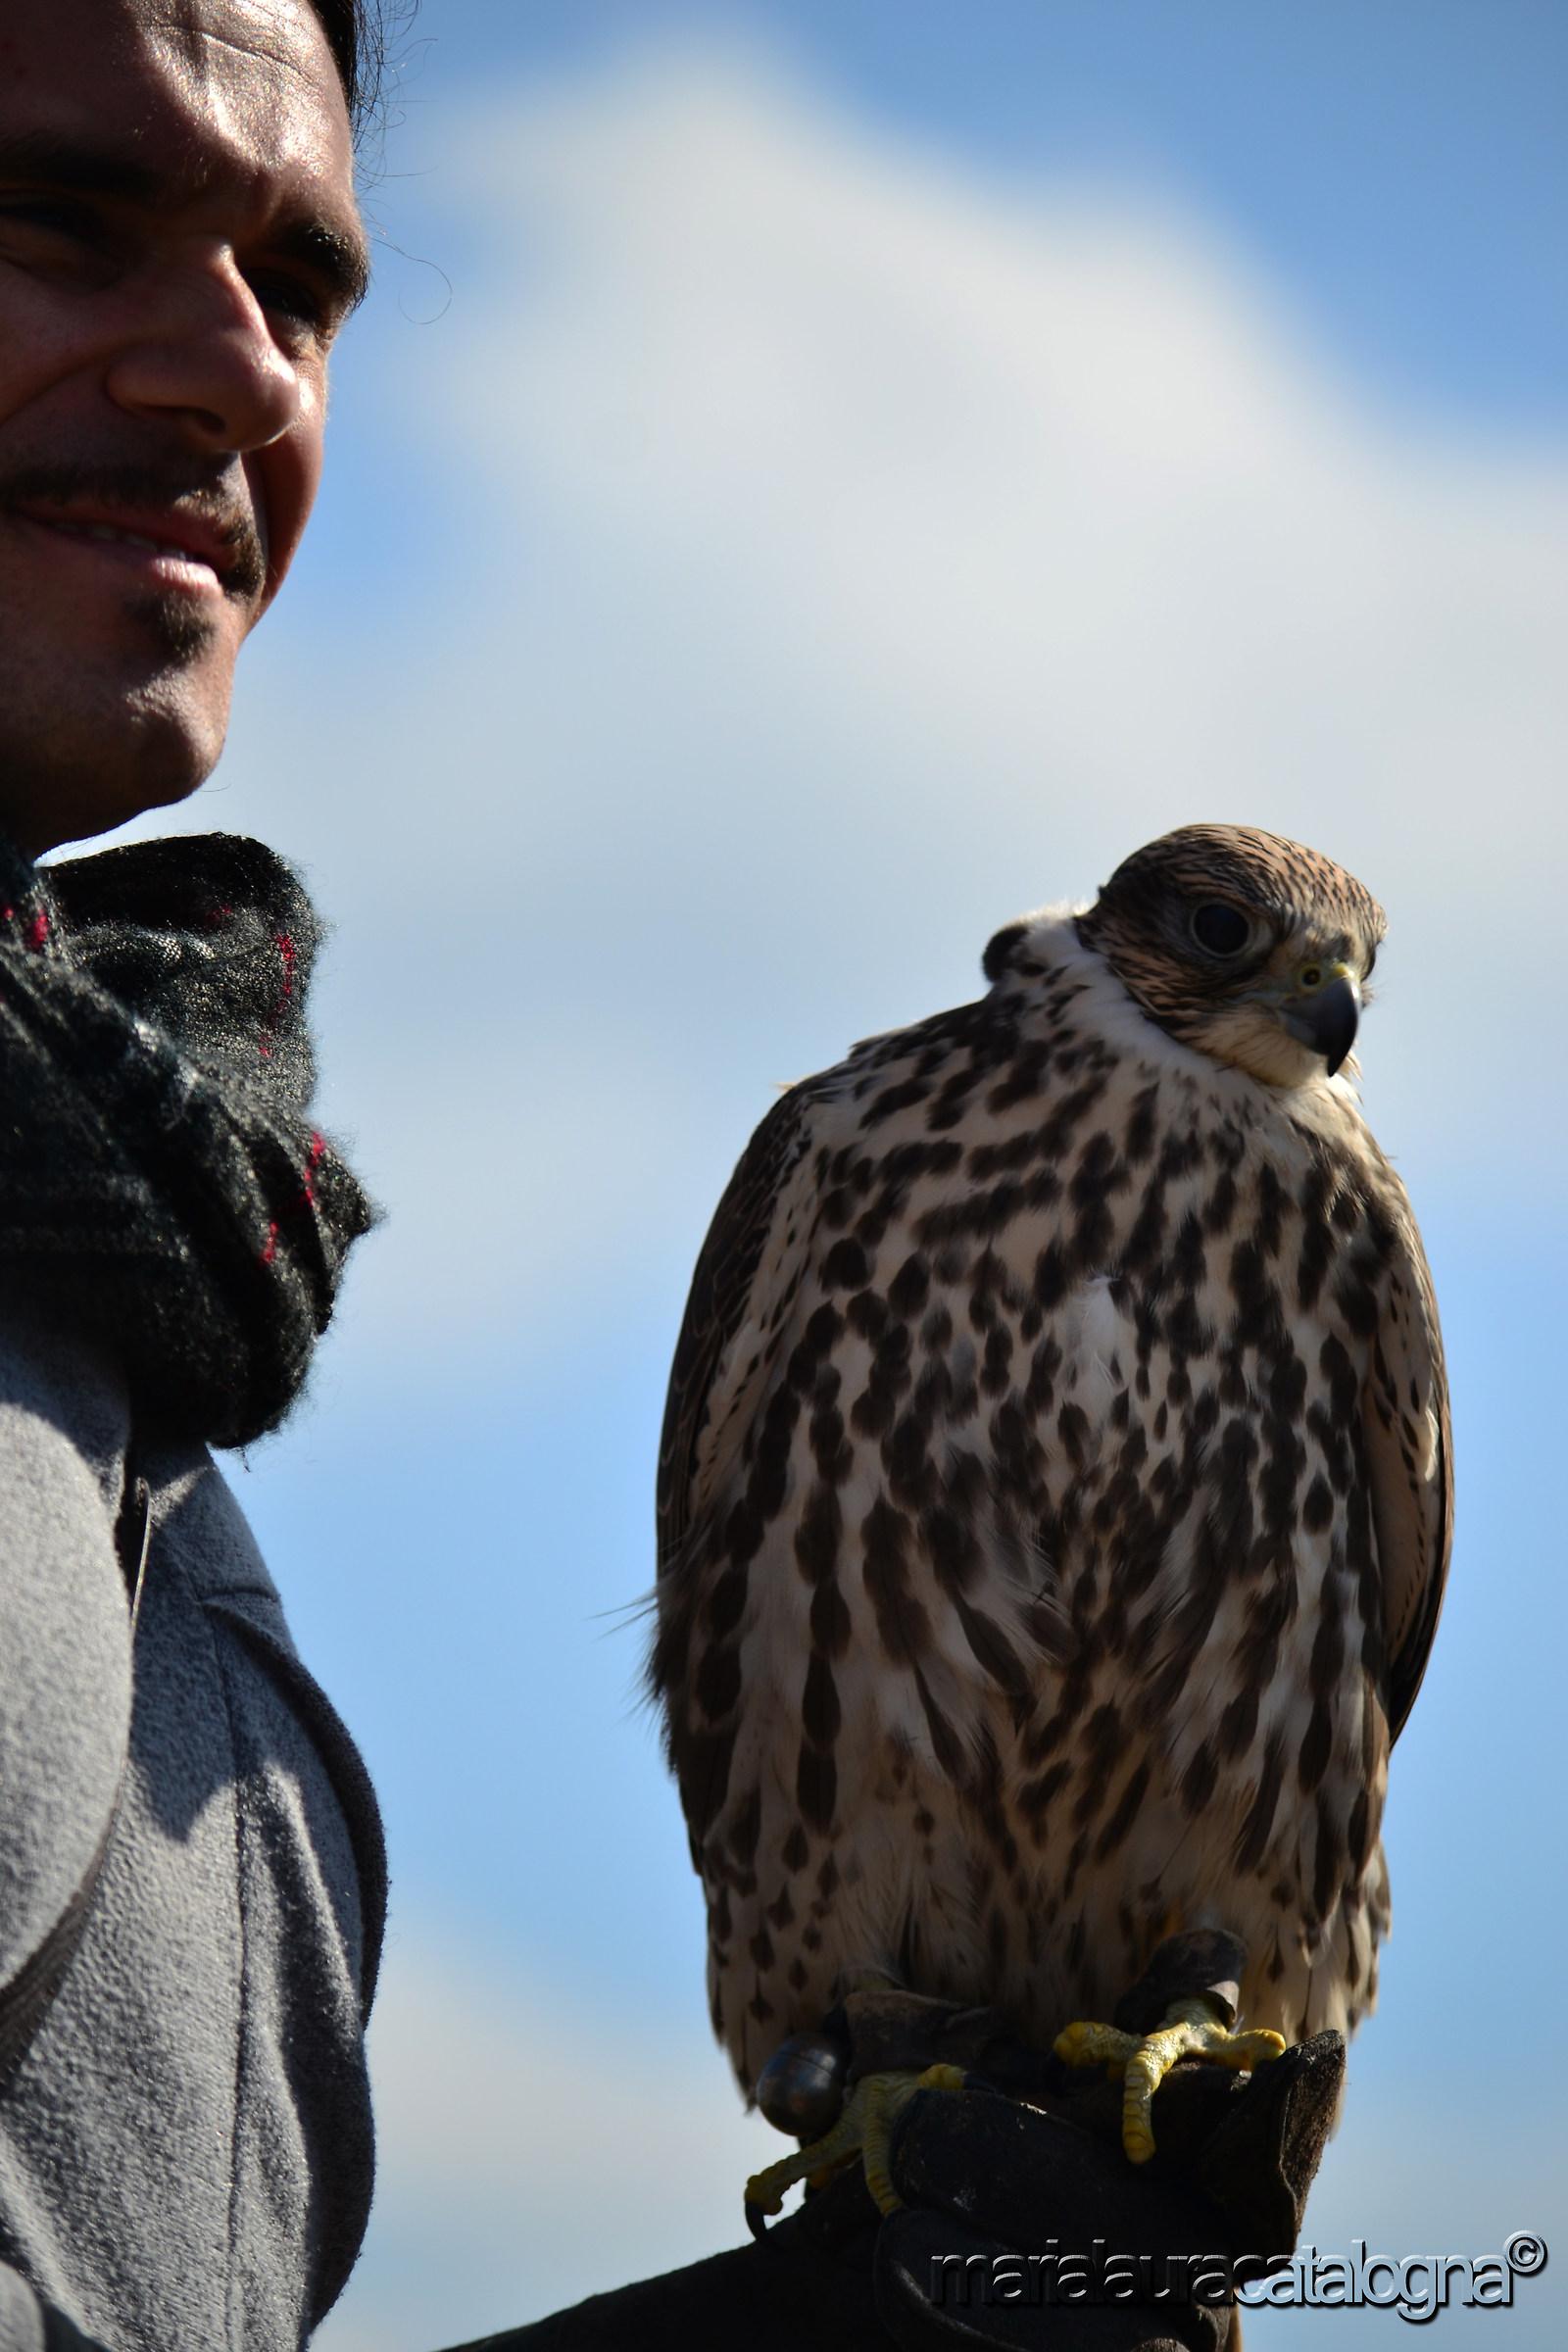 The falconer and the falcon...